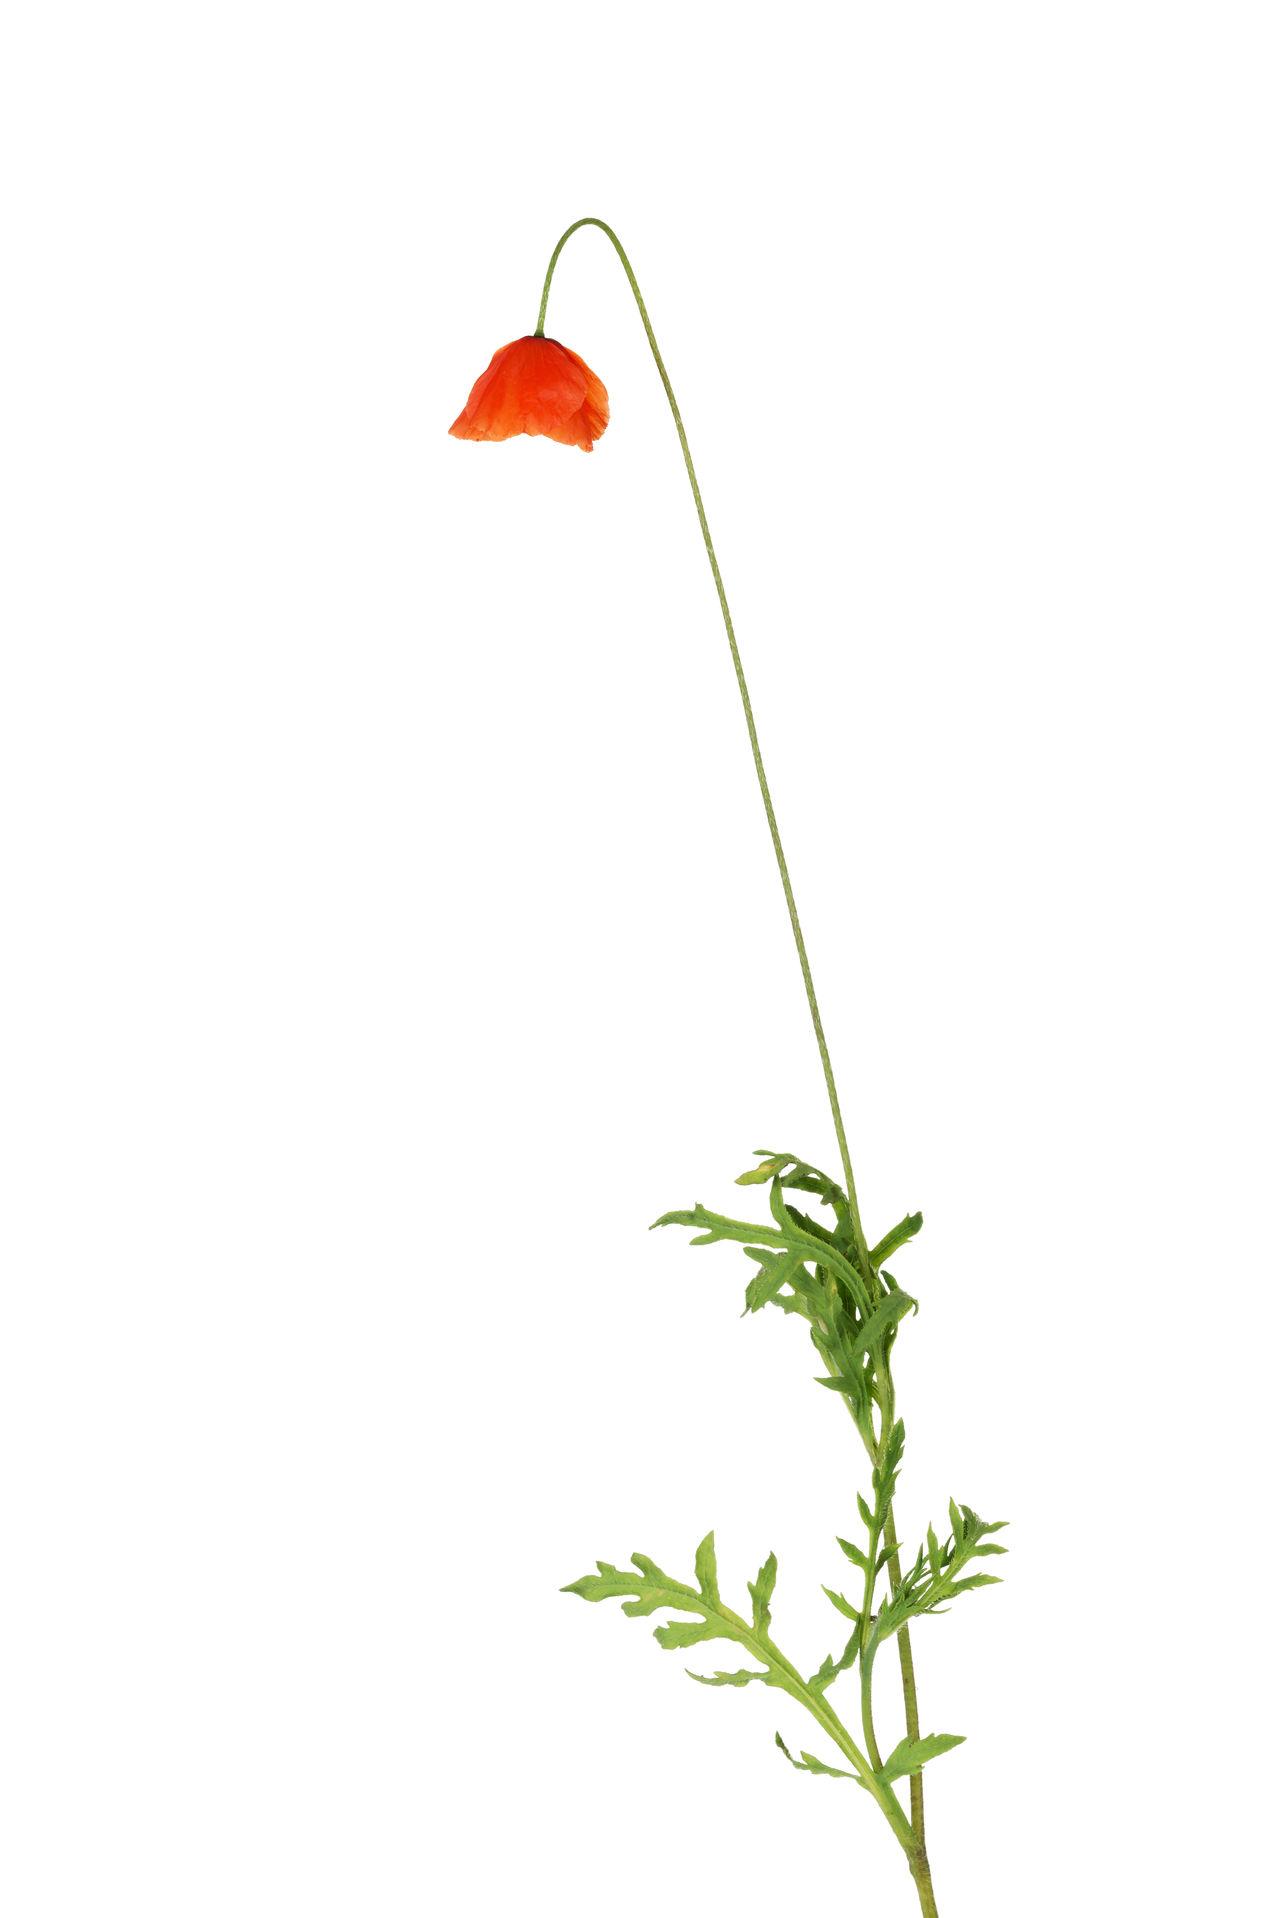 Freshness Nature No People Poppy Flowers Red Red Flower Studio Shot White Background